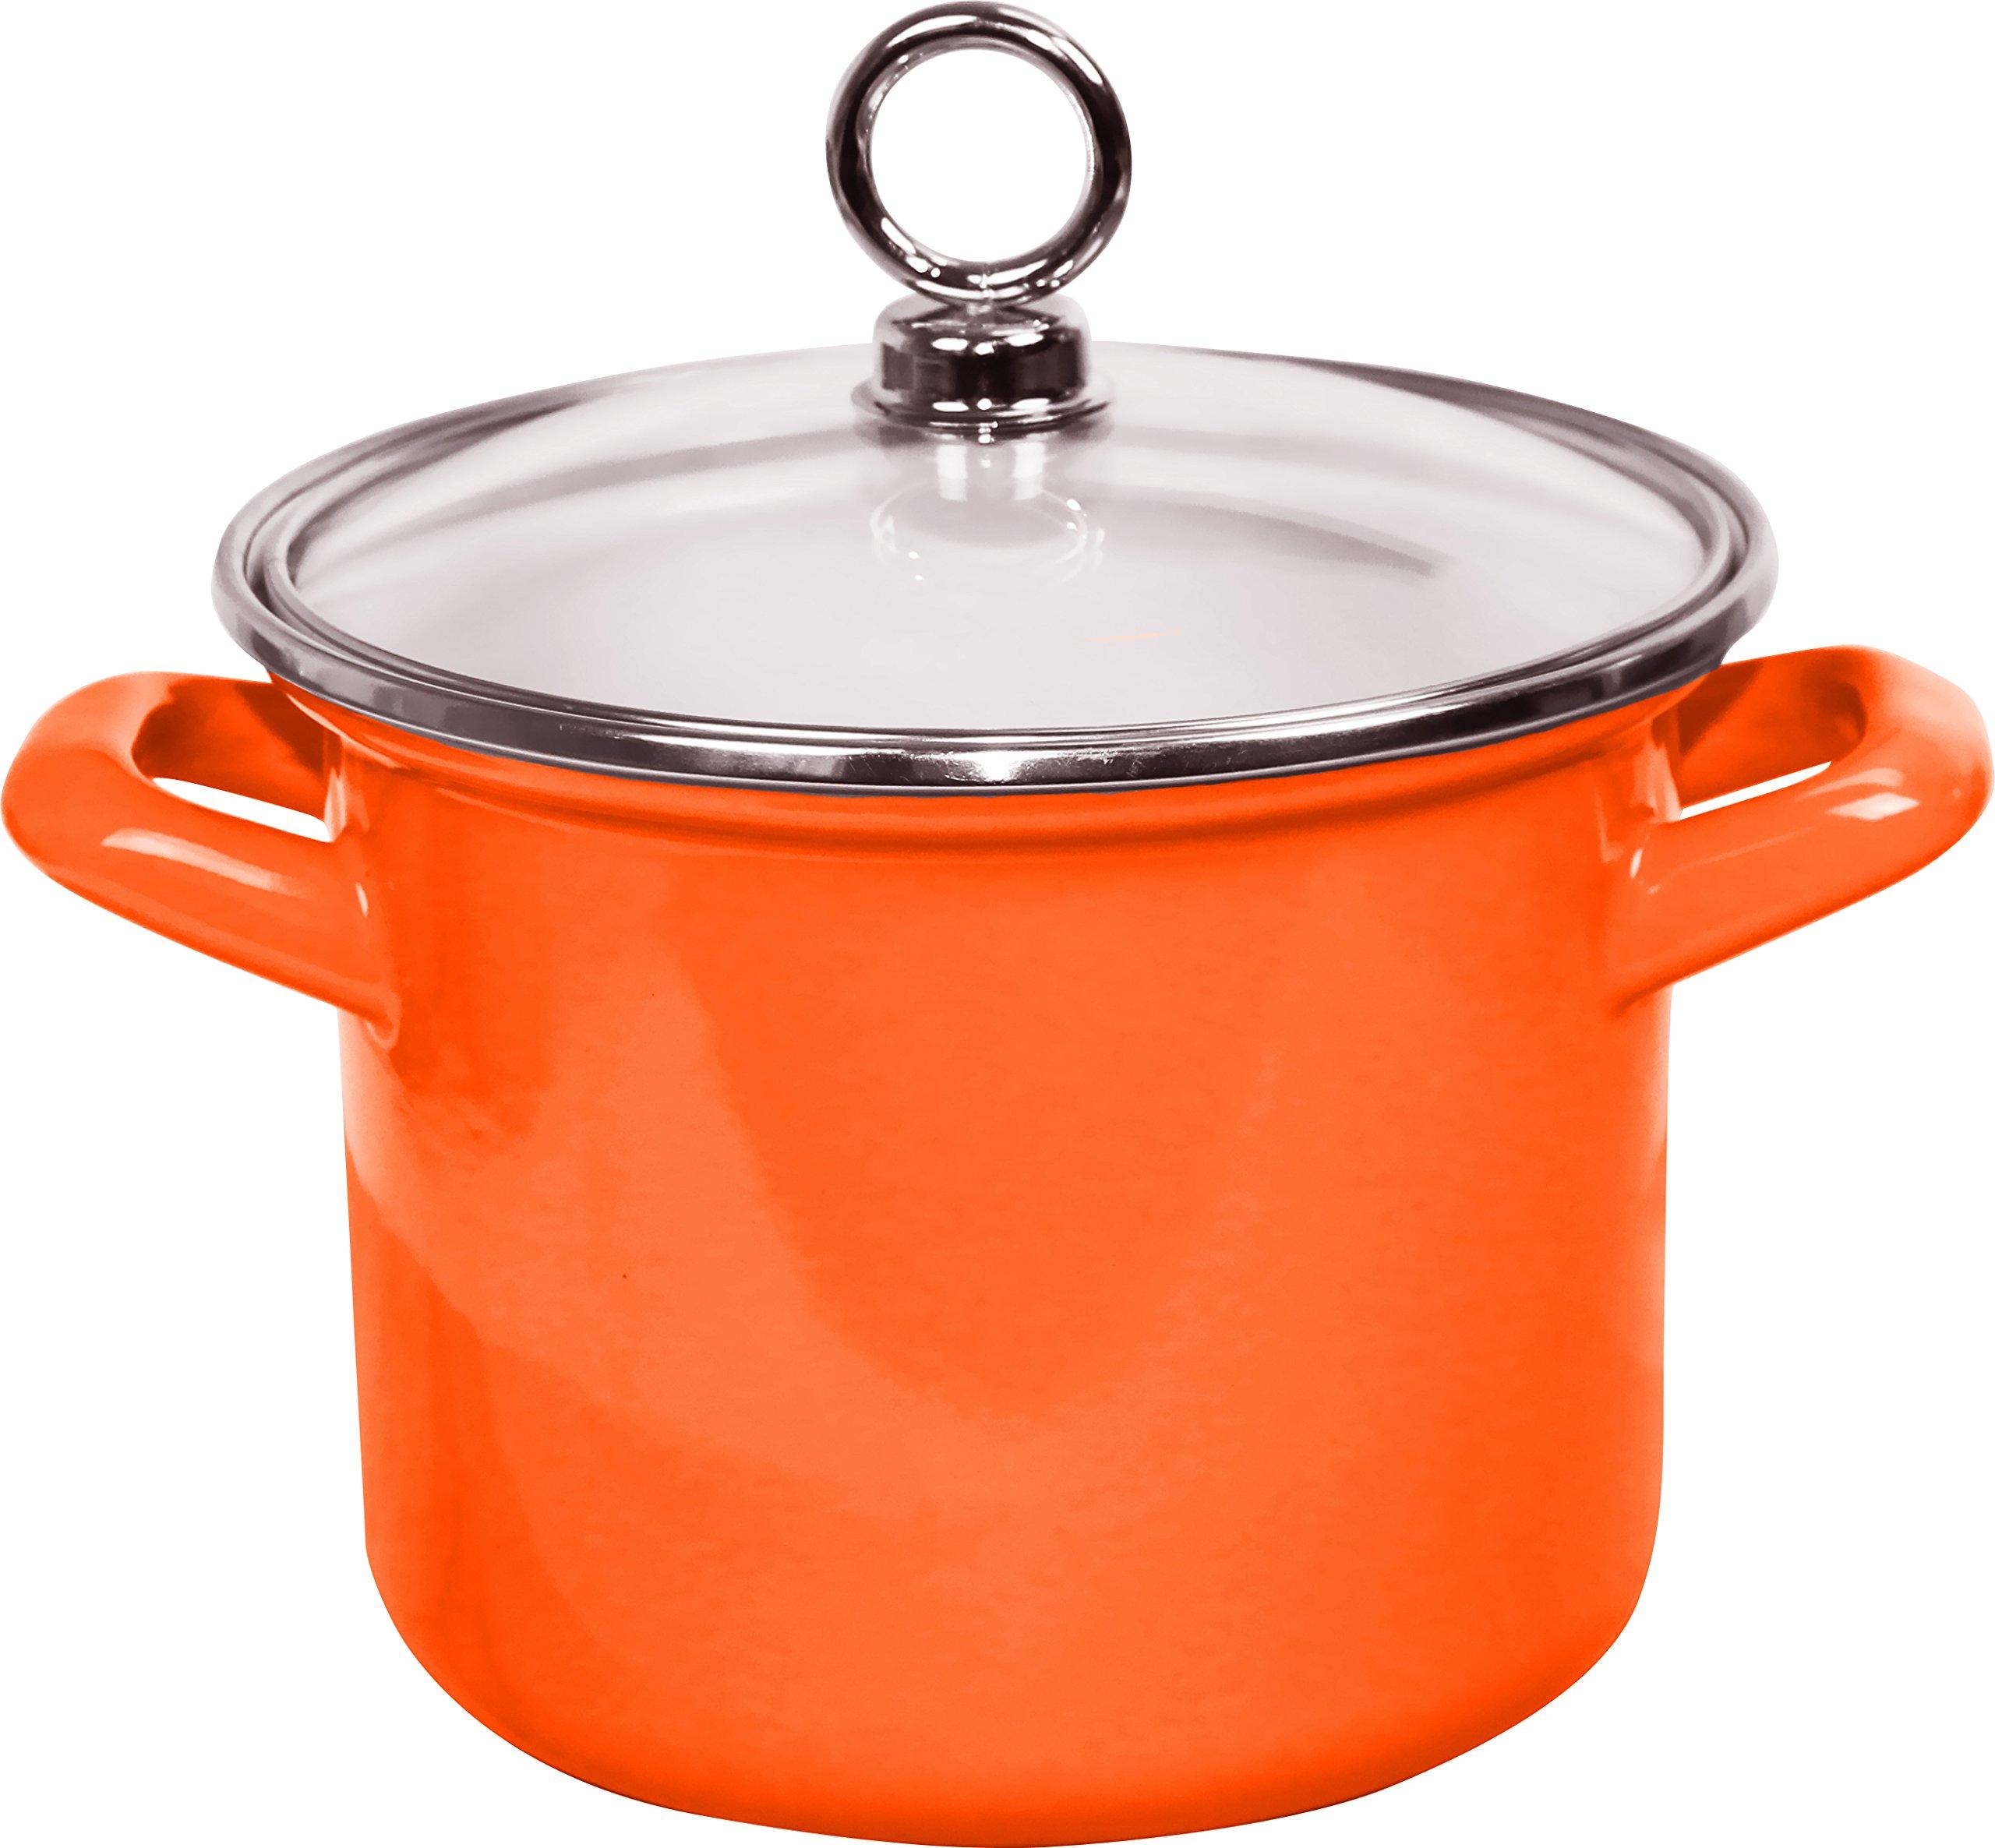 Calypso Basics by Reston Lloyd Enamel Stockpot with Glass Lid, 3.5-Quart, Orange